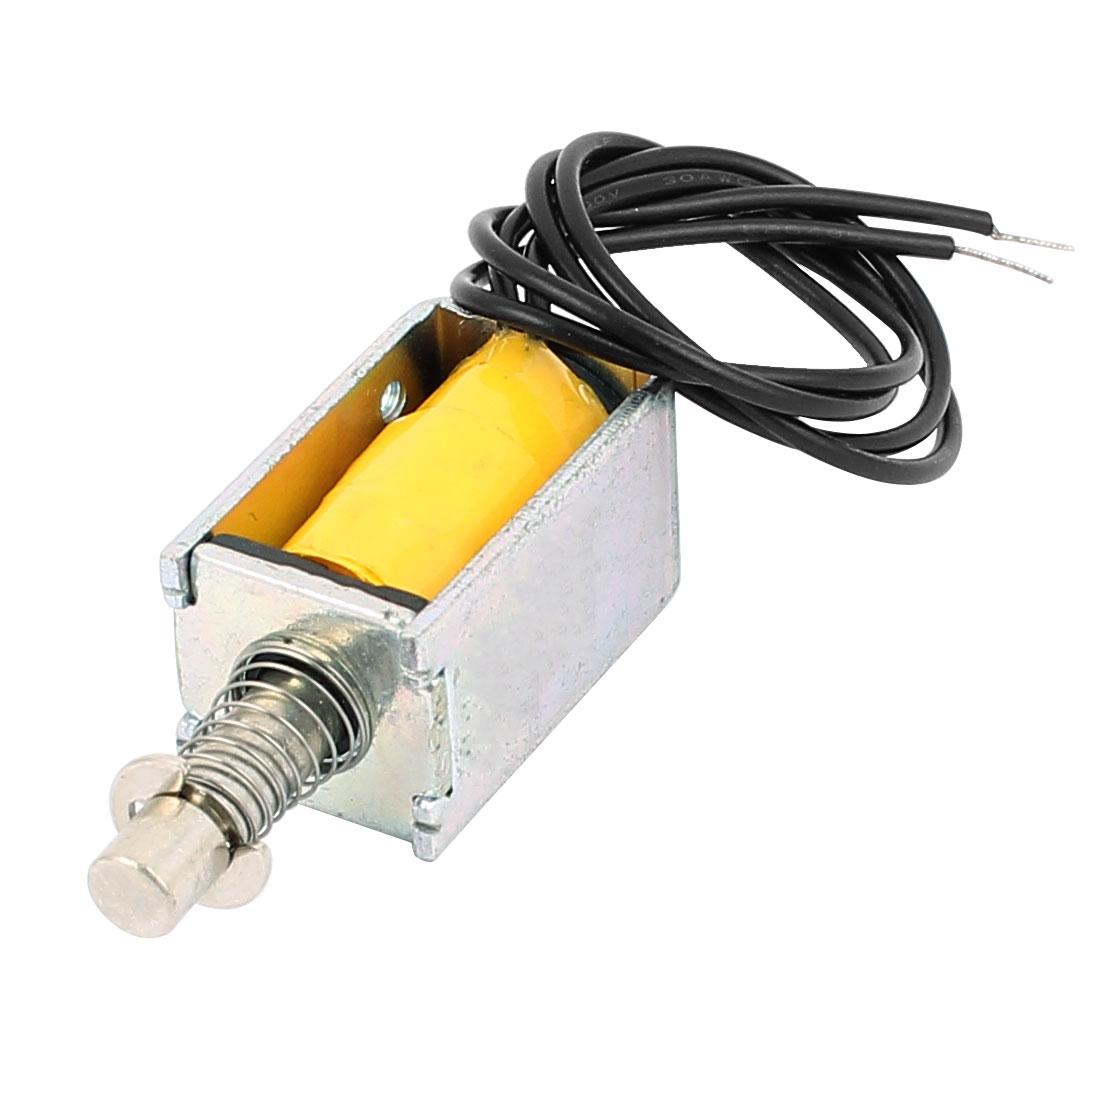 HTO-0420L12V06 DC 12V 2A Pull Type Open Frame Actuator Electric Solenoid Electromagnet